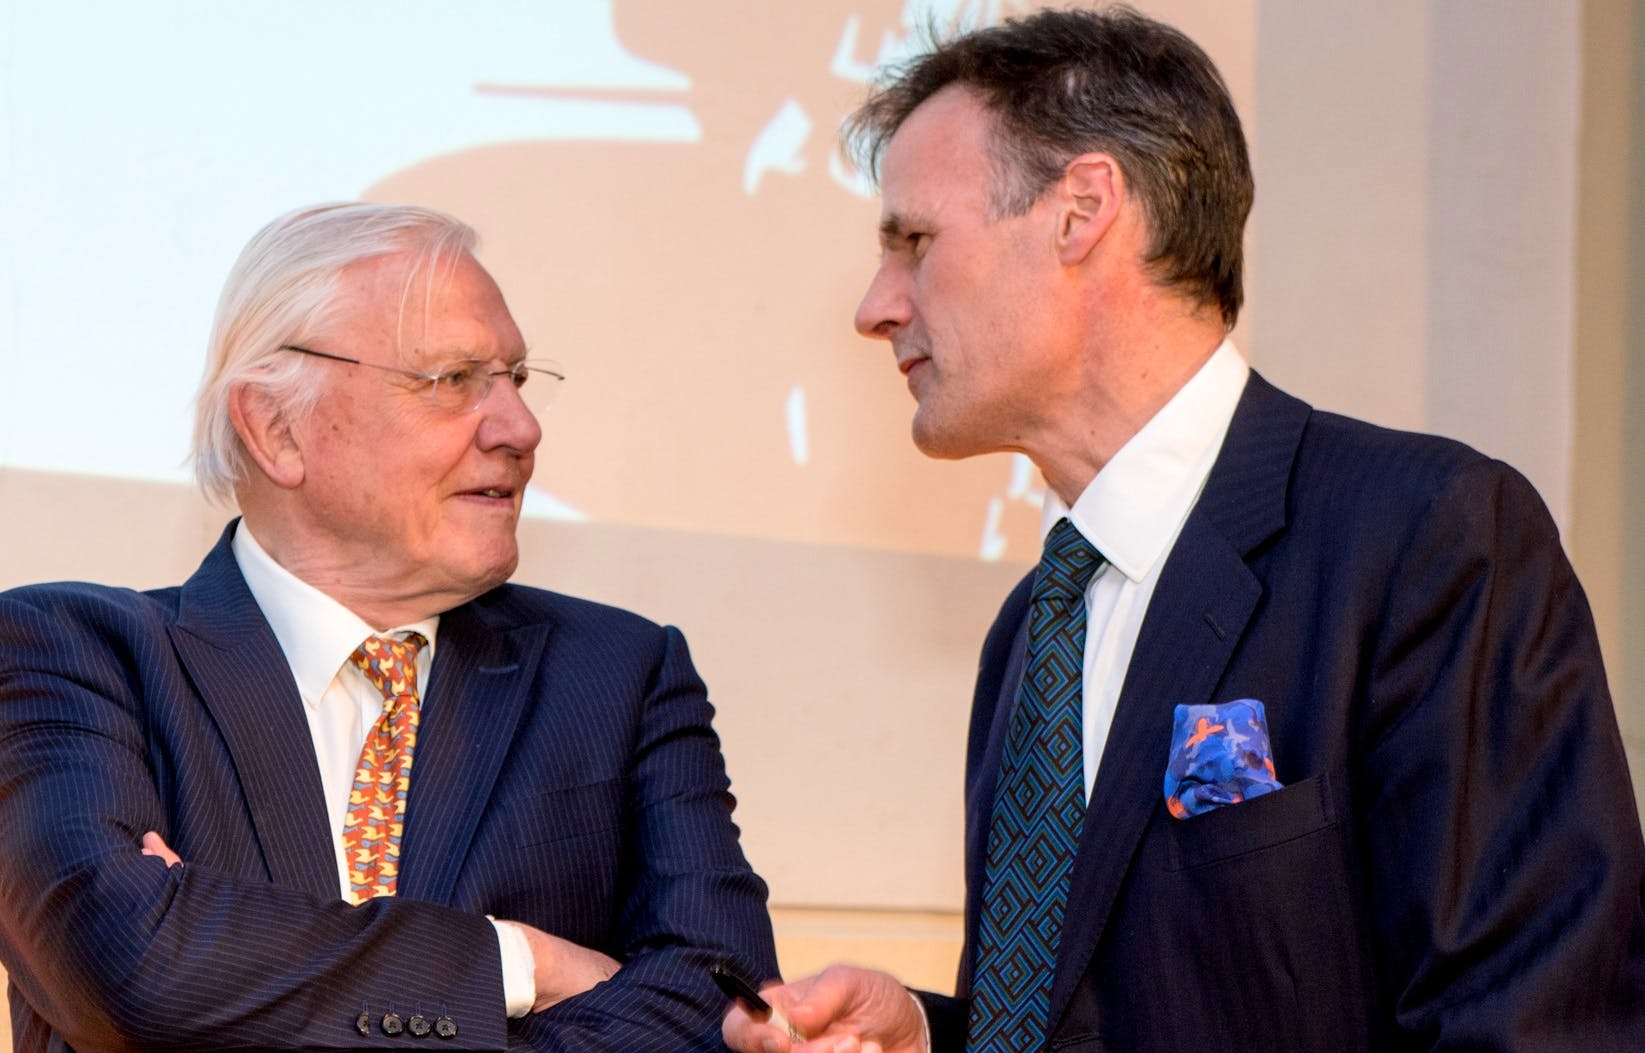 Sir David Attenborough and Edward Whitley